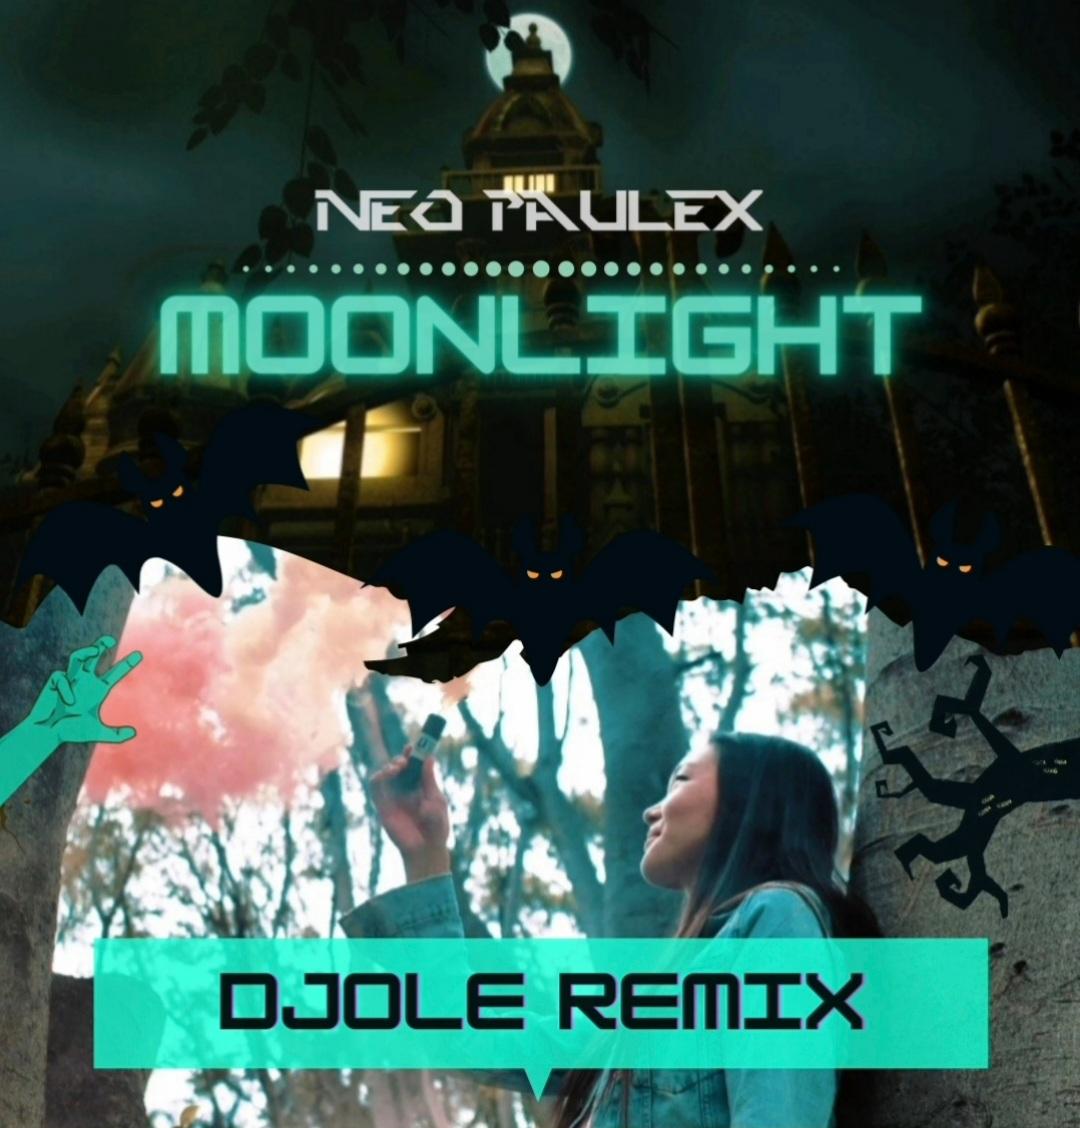 Neo Paulex - Moonlight (Djole Remix)